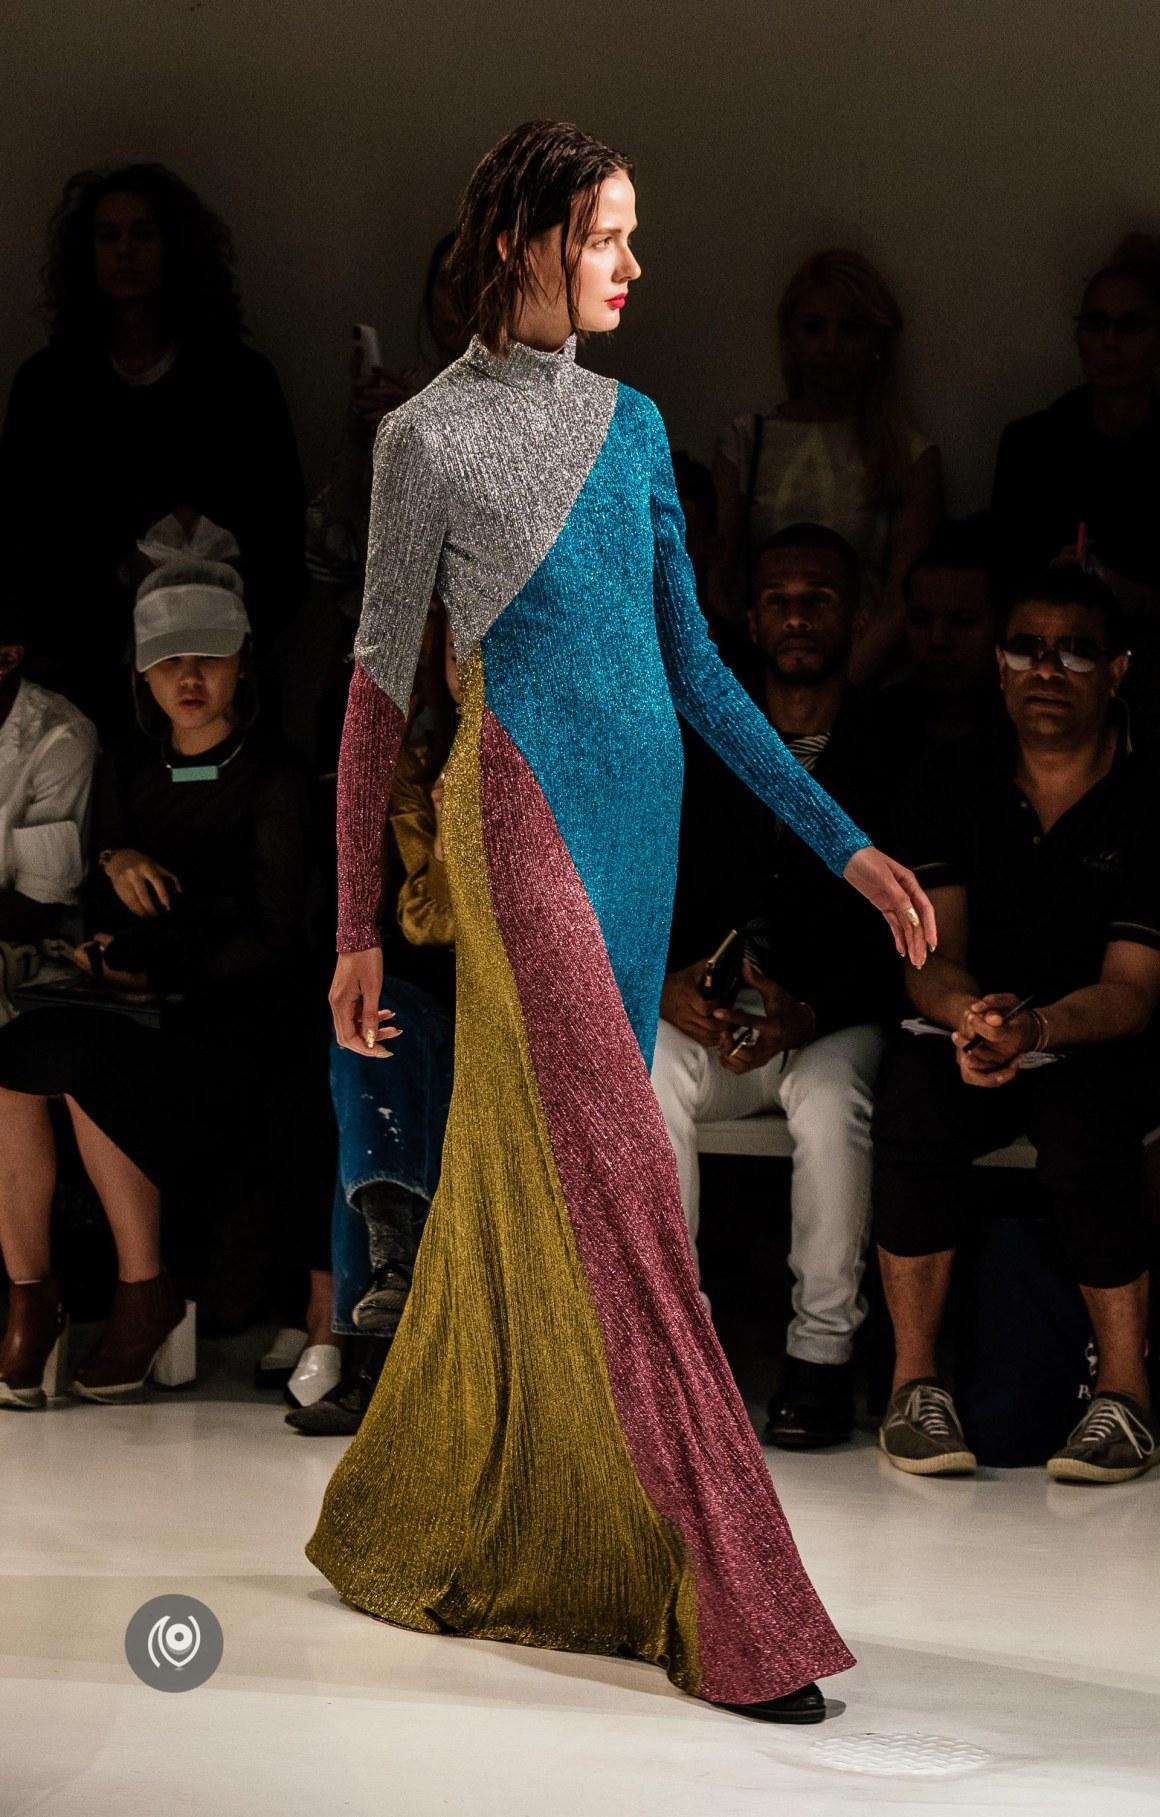 Kathleen KYE, SS16, NYFW, New York Fashion Week, #EyesForNewYork #REDHUxNYC Naina.co Luxury & Lifestyle, Photographer Storyteller, Blogger